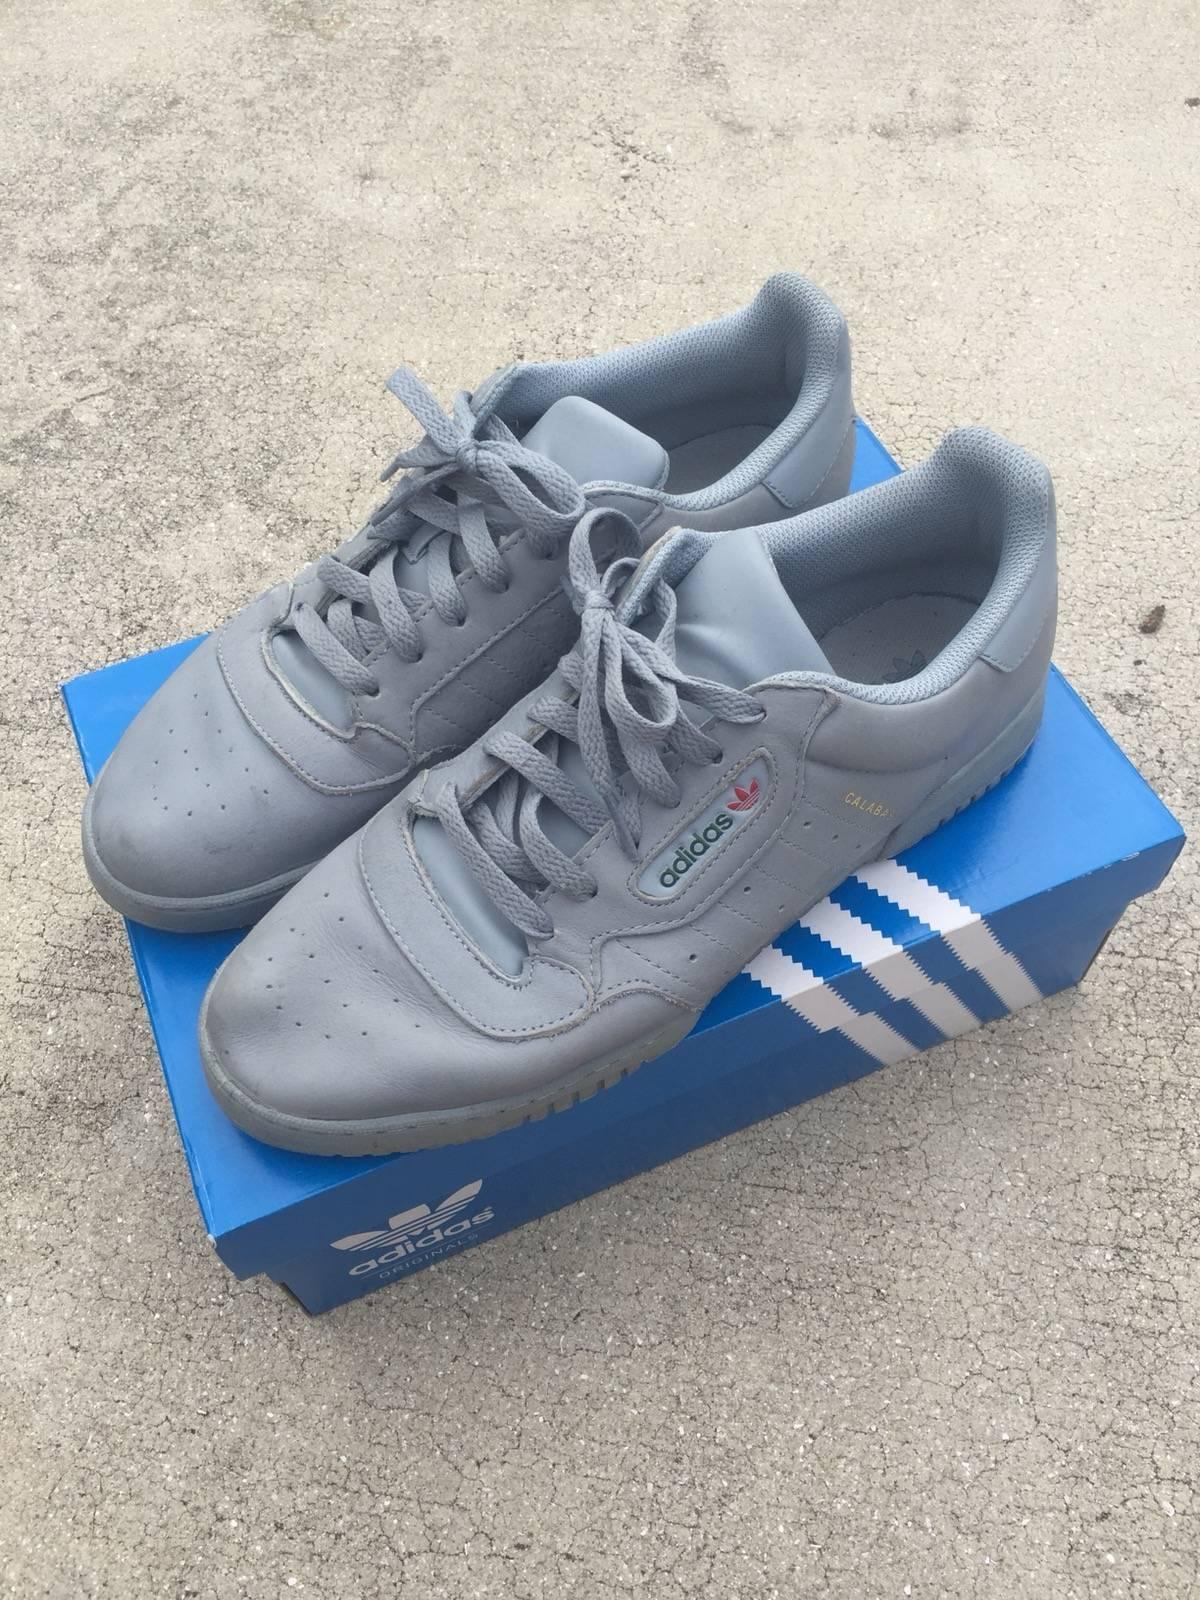 82d8c08744dc9 Adidas Kanye West Steal Week -yeezy Powerphase Grey